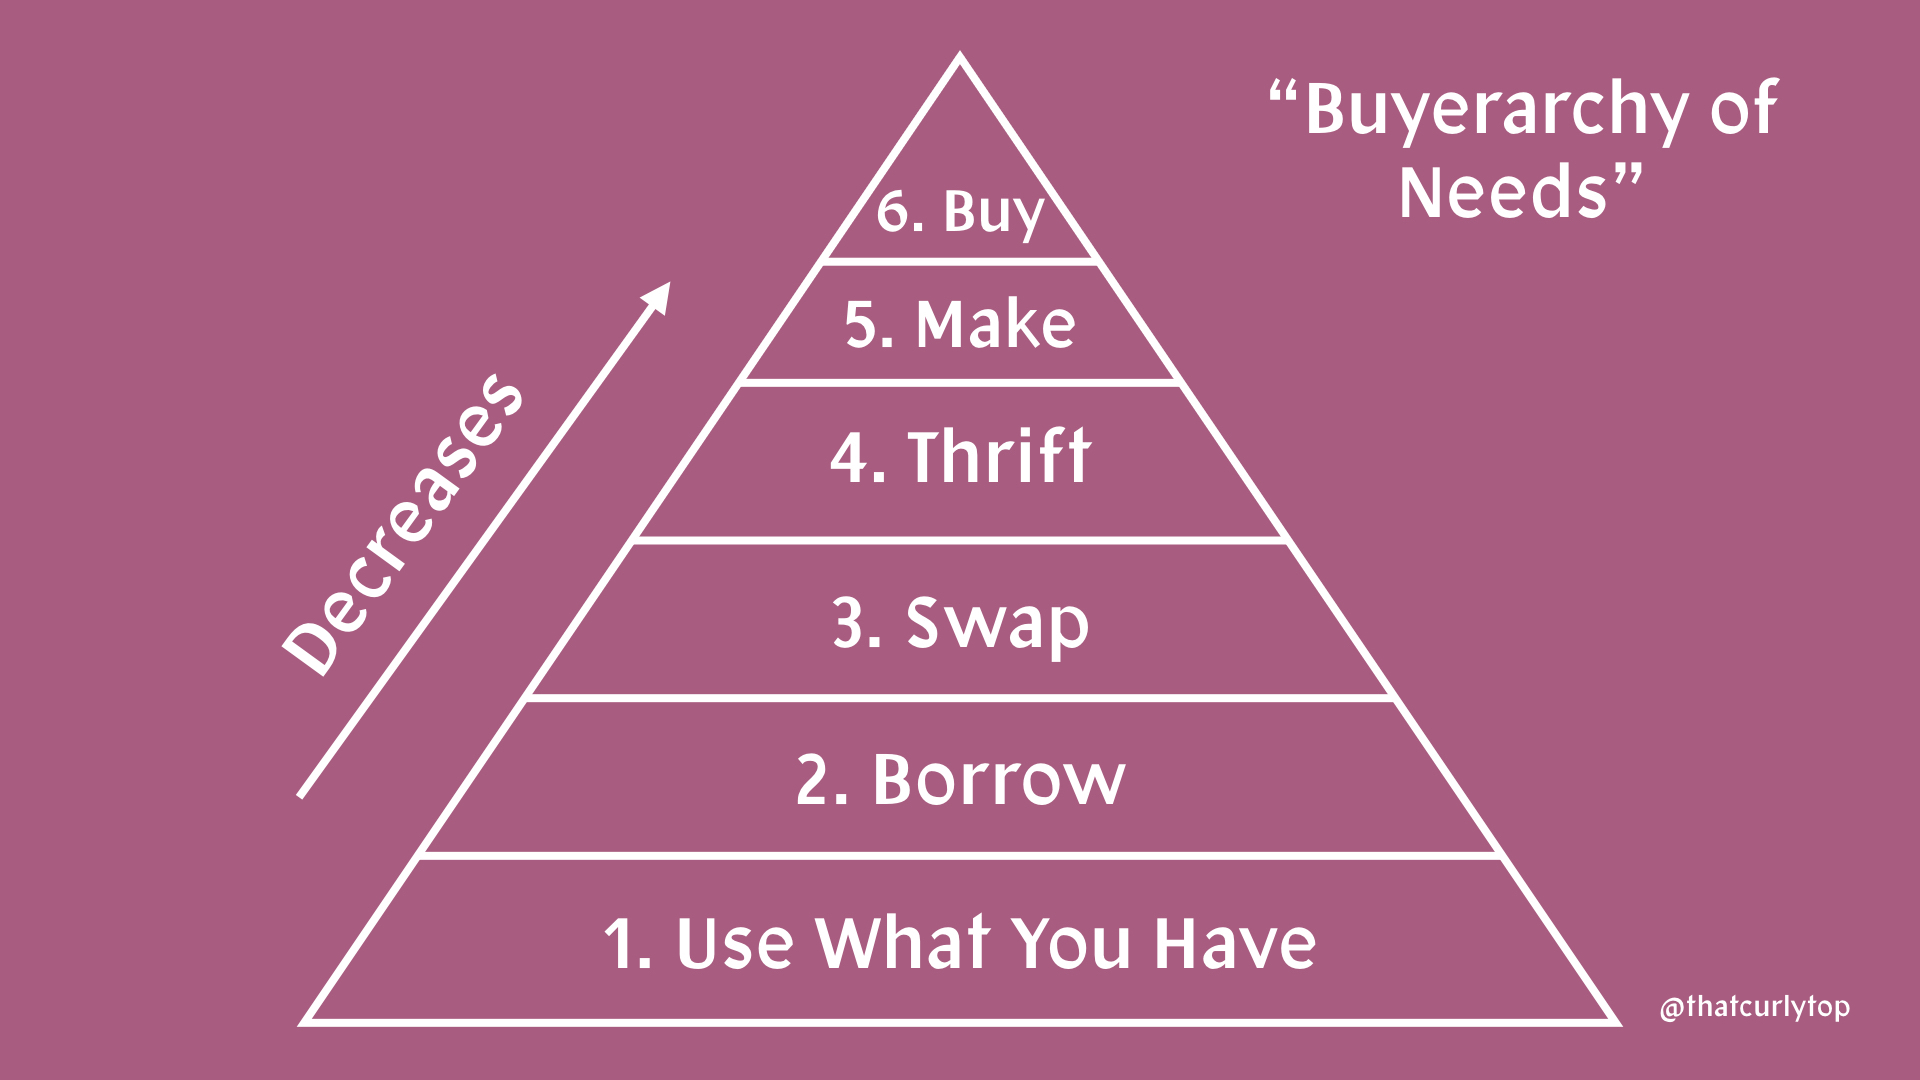 Buyerarchy of Needs by TCT.001.jpeg